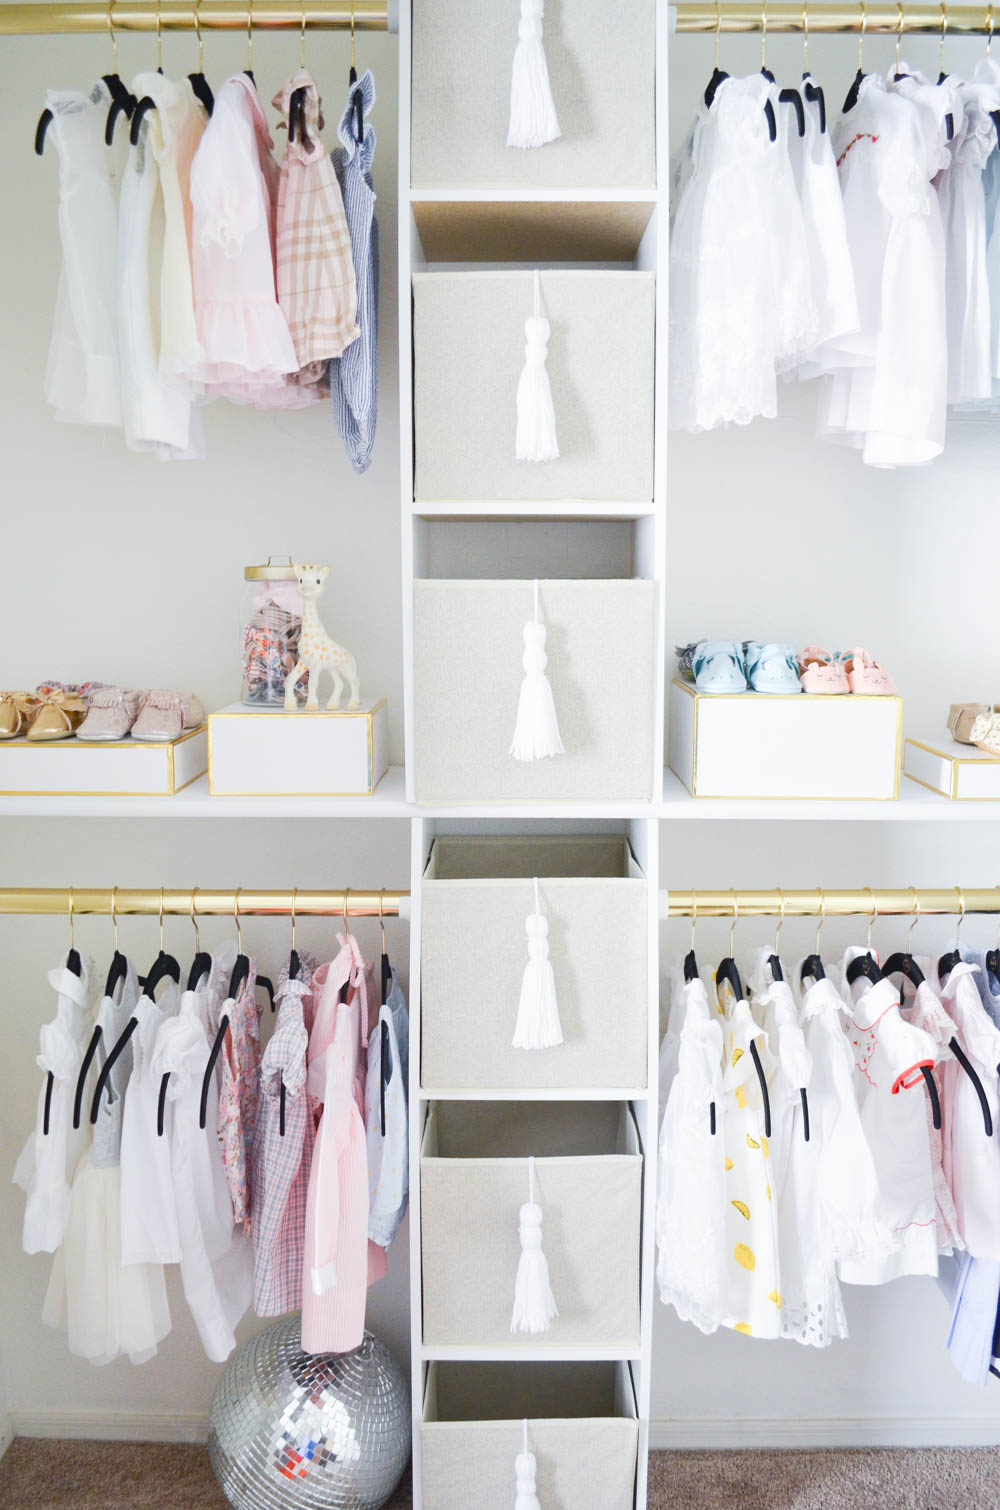 Yarn+Tassel+Storage+Bins+DIY+_+Under+$2+and+simple!+_+How+to+make+a+yarn+tassel+_+Baby+Girl+Closet.jpg